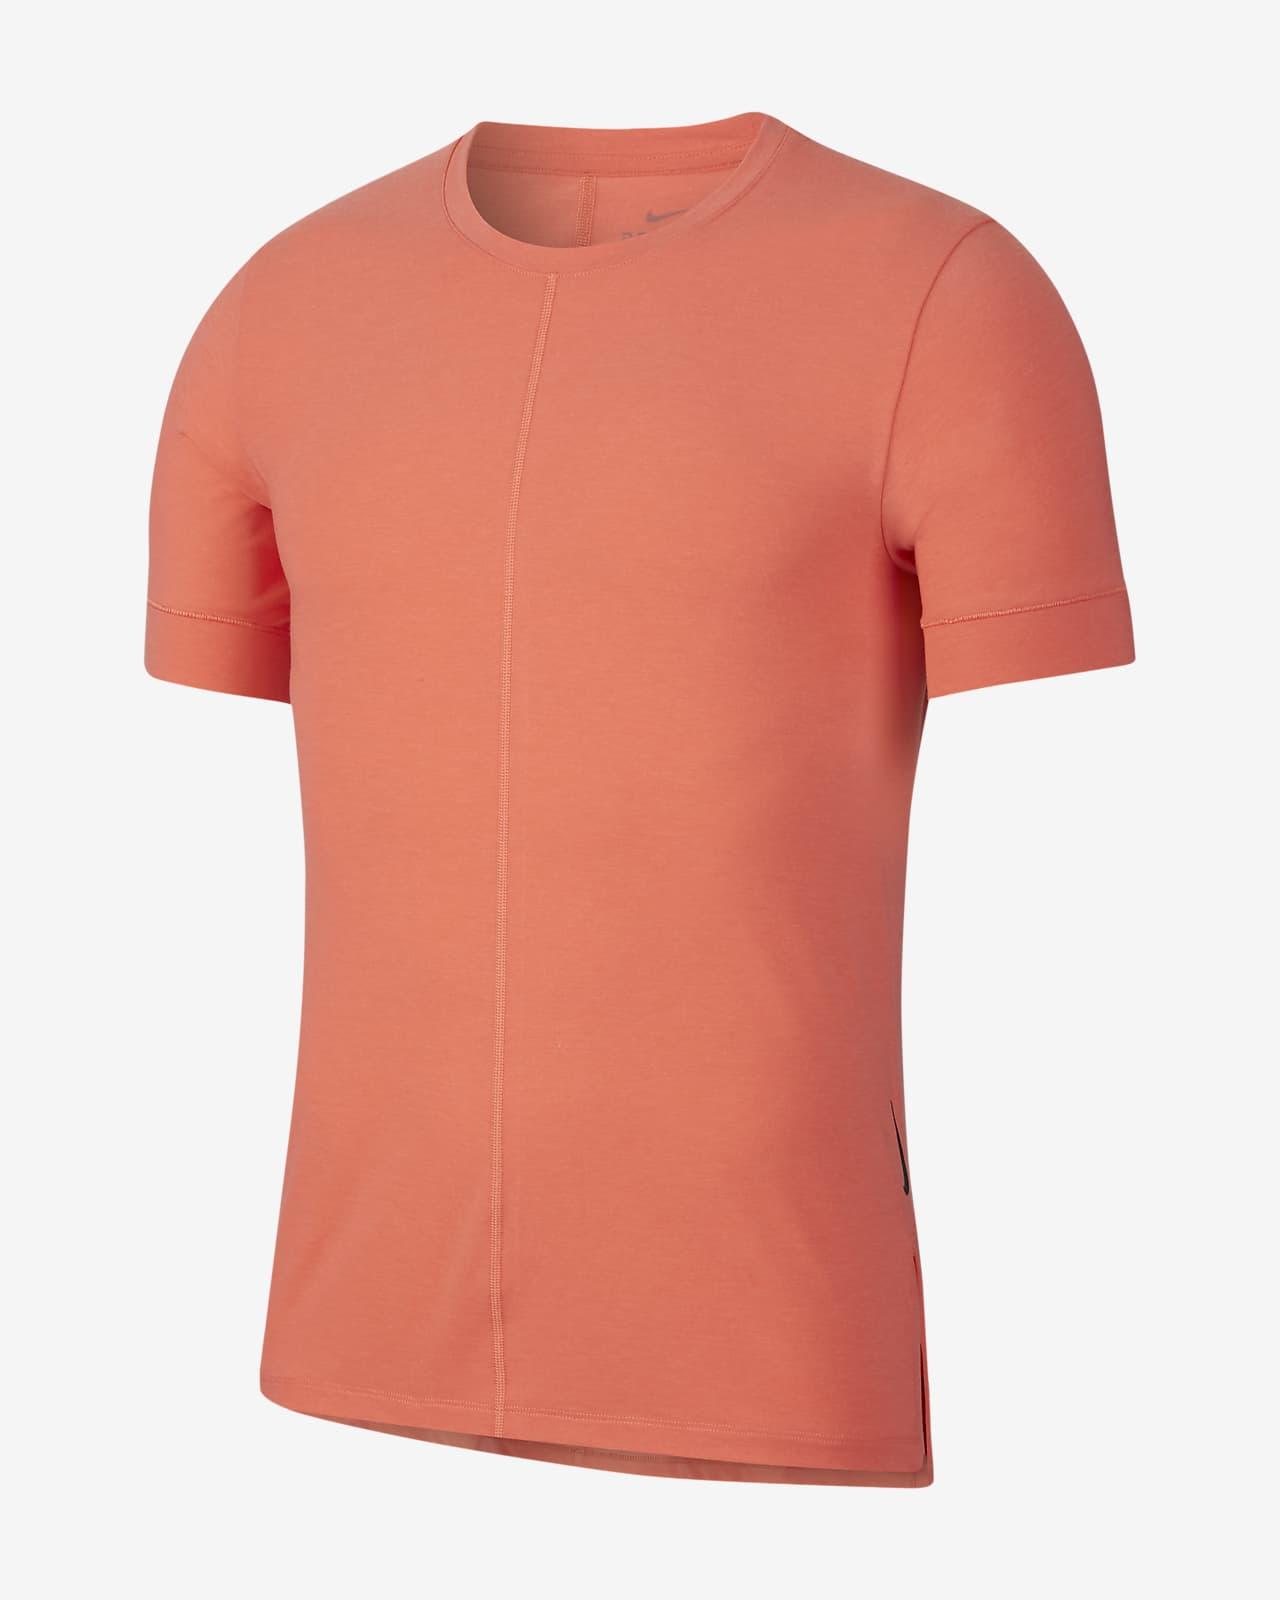 Nike Yoga 男子短袖上衣